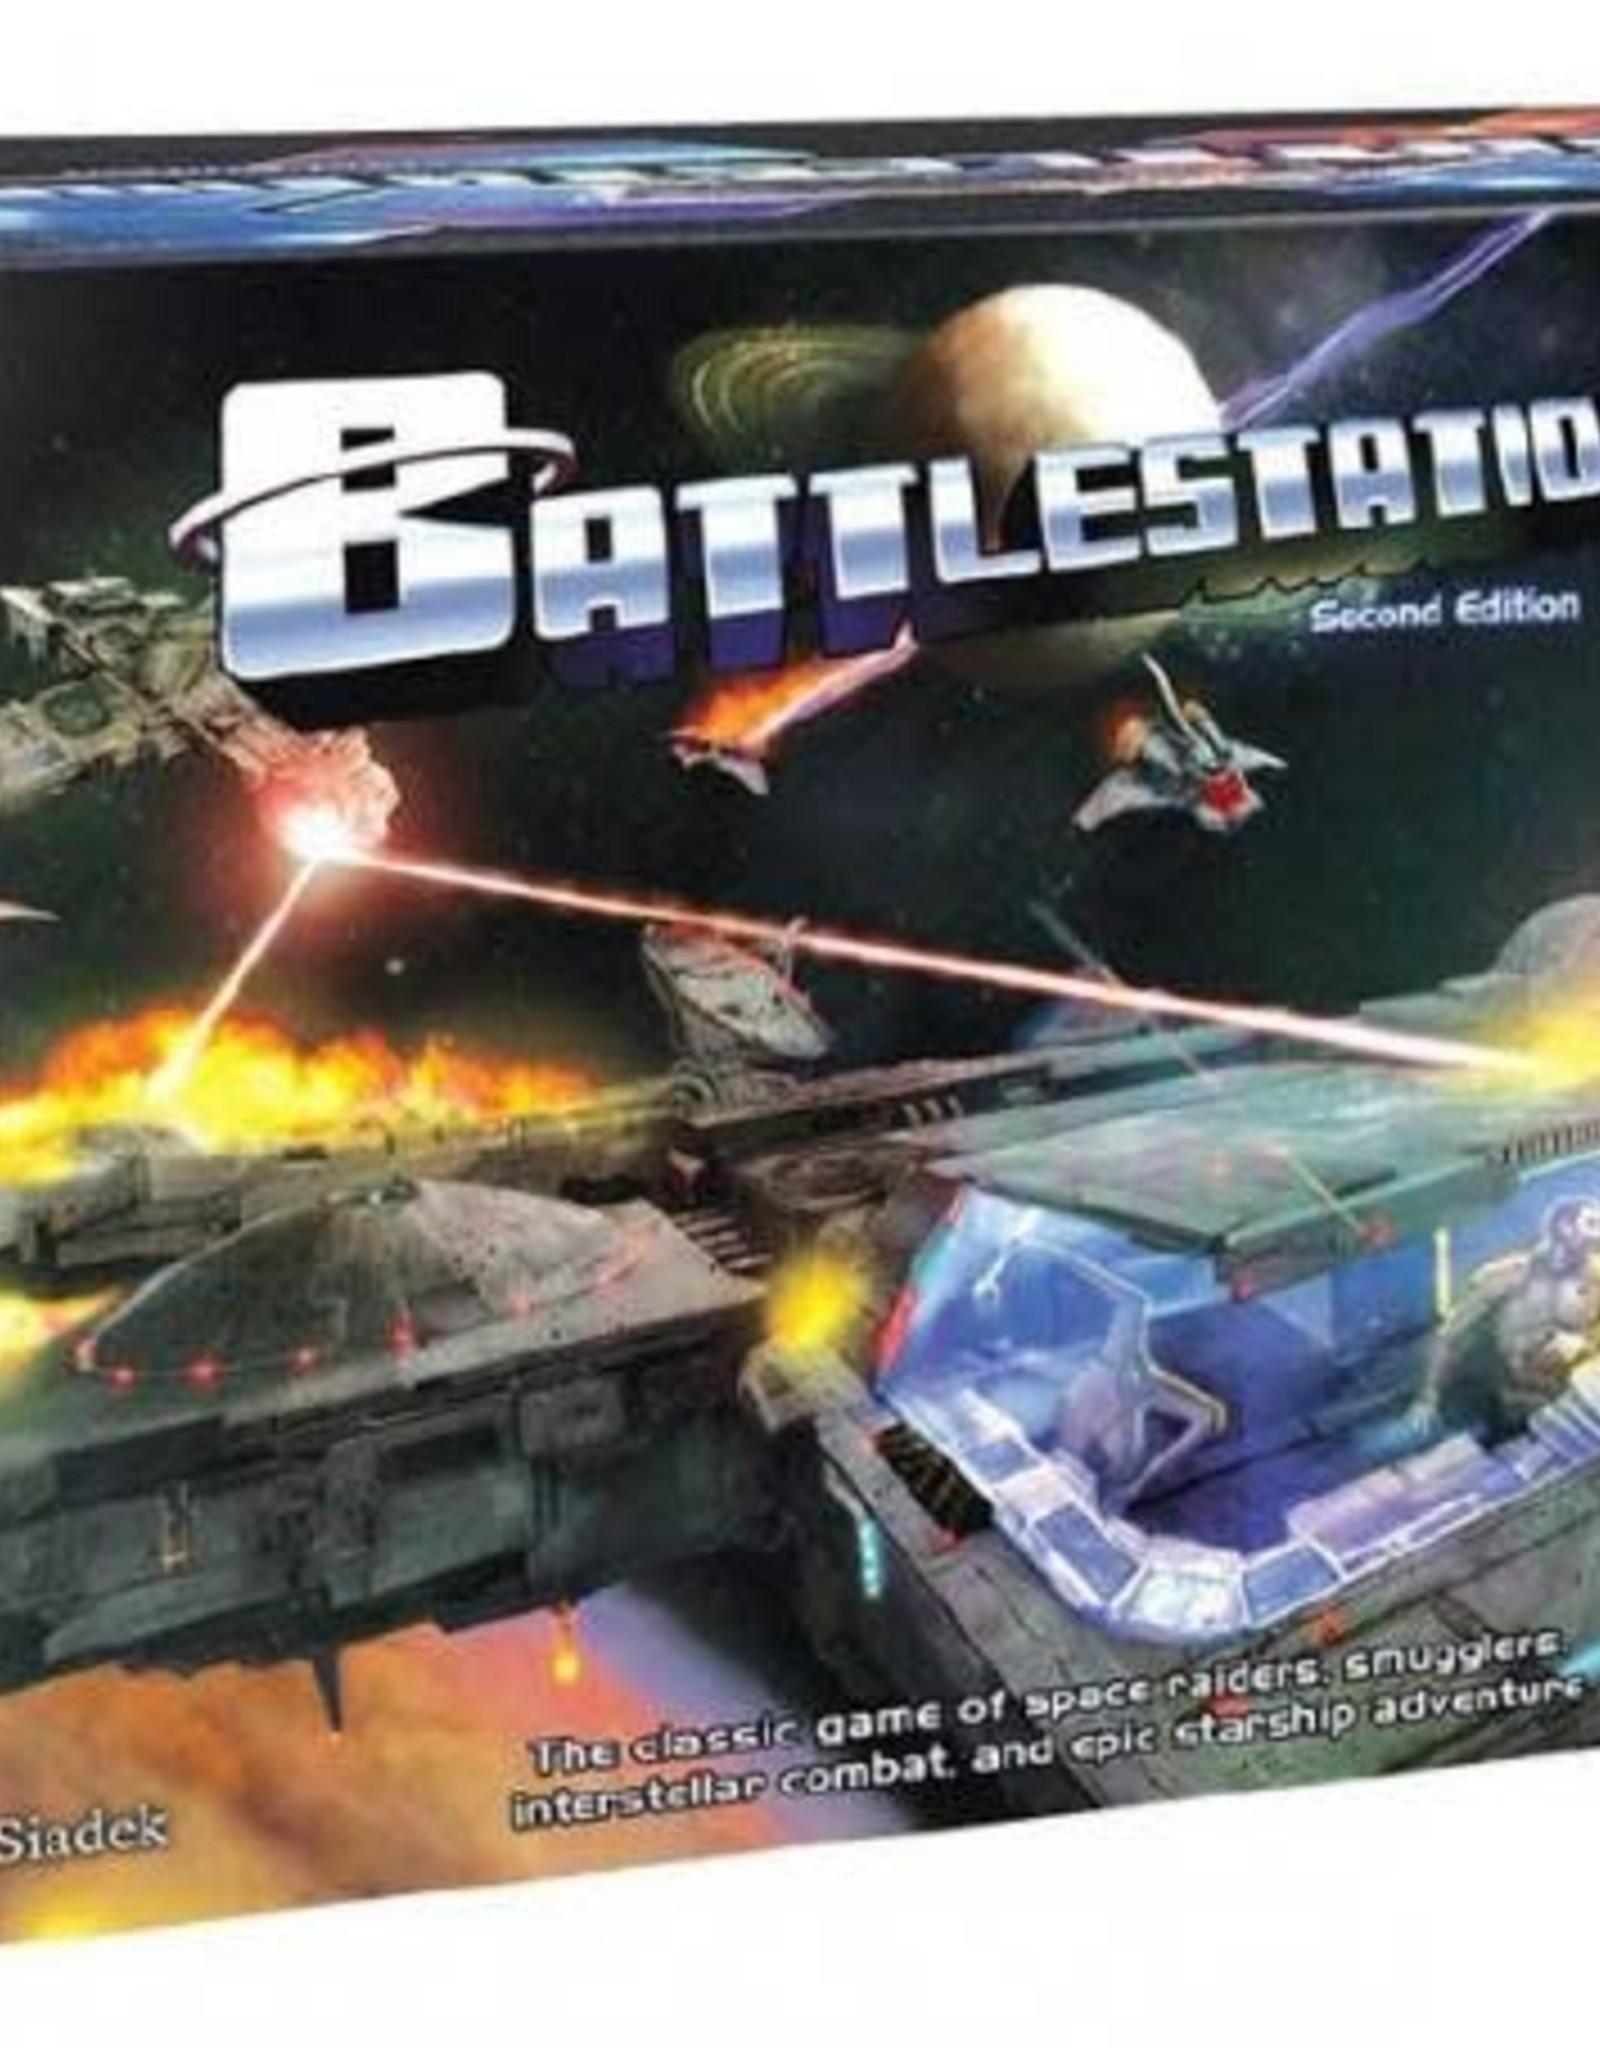 Battlestations: Second Edition Box